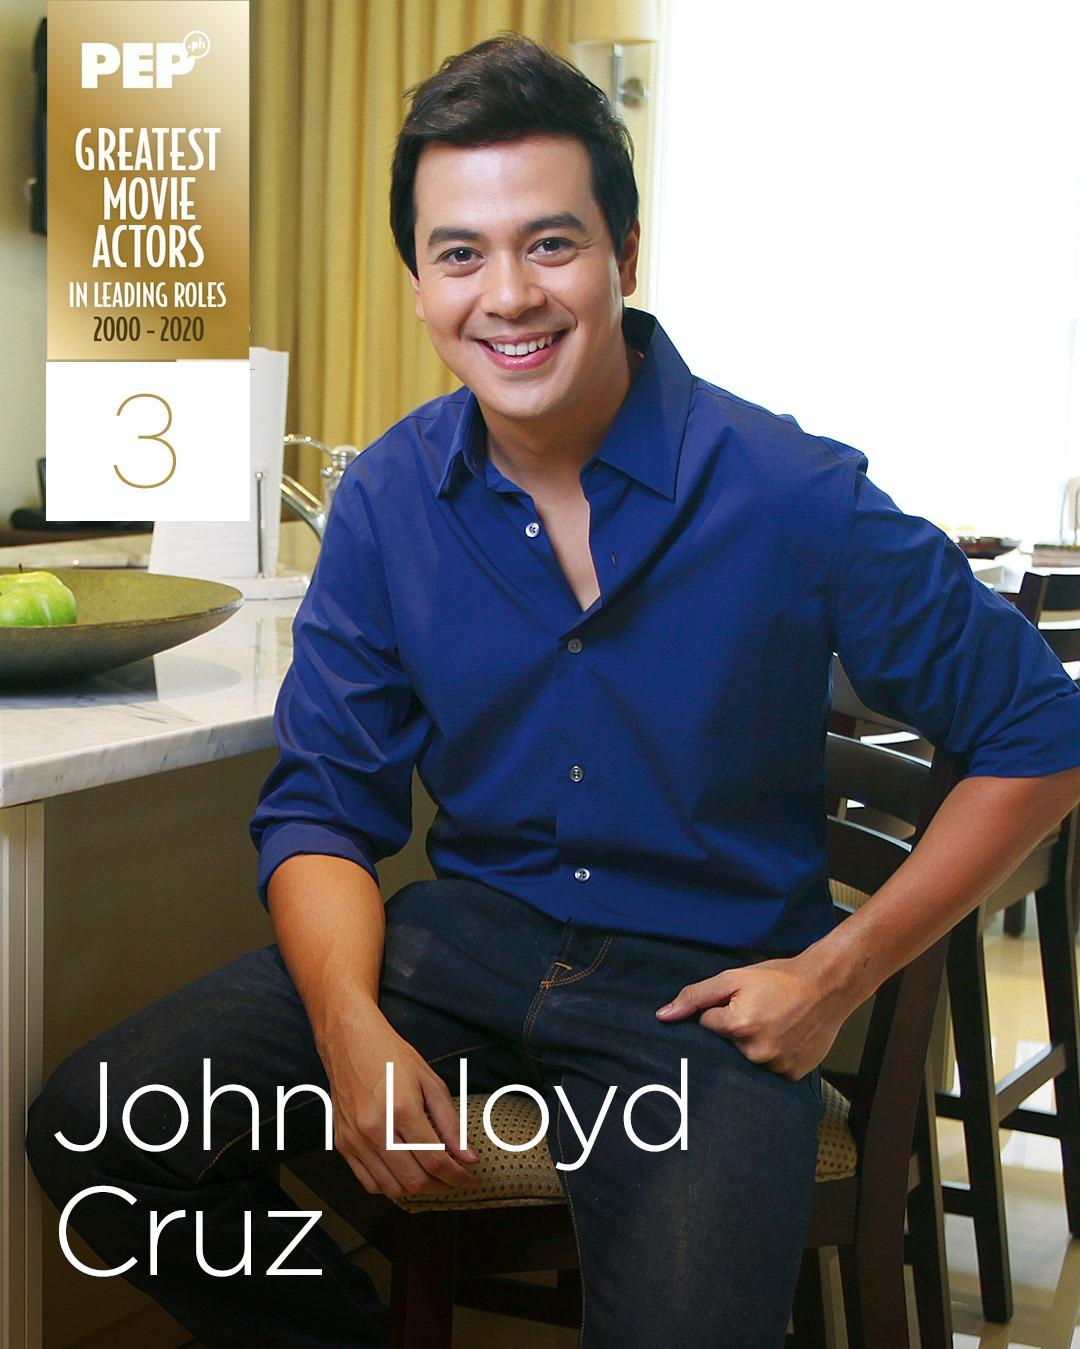 John Lloyd Cruz, 15 Greatest Movie Actors in Leading Roles